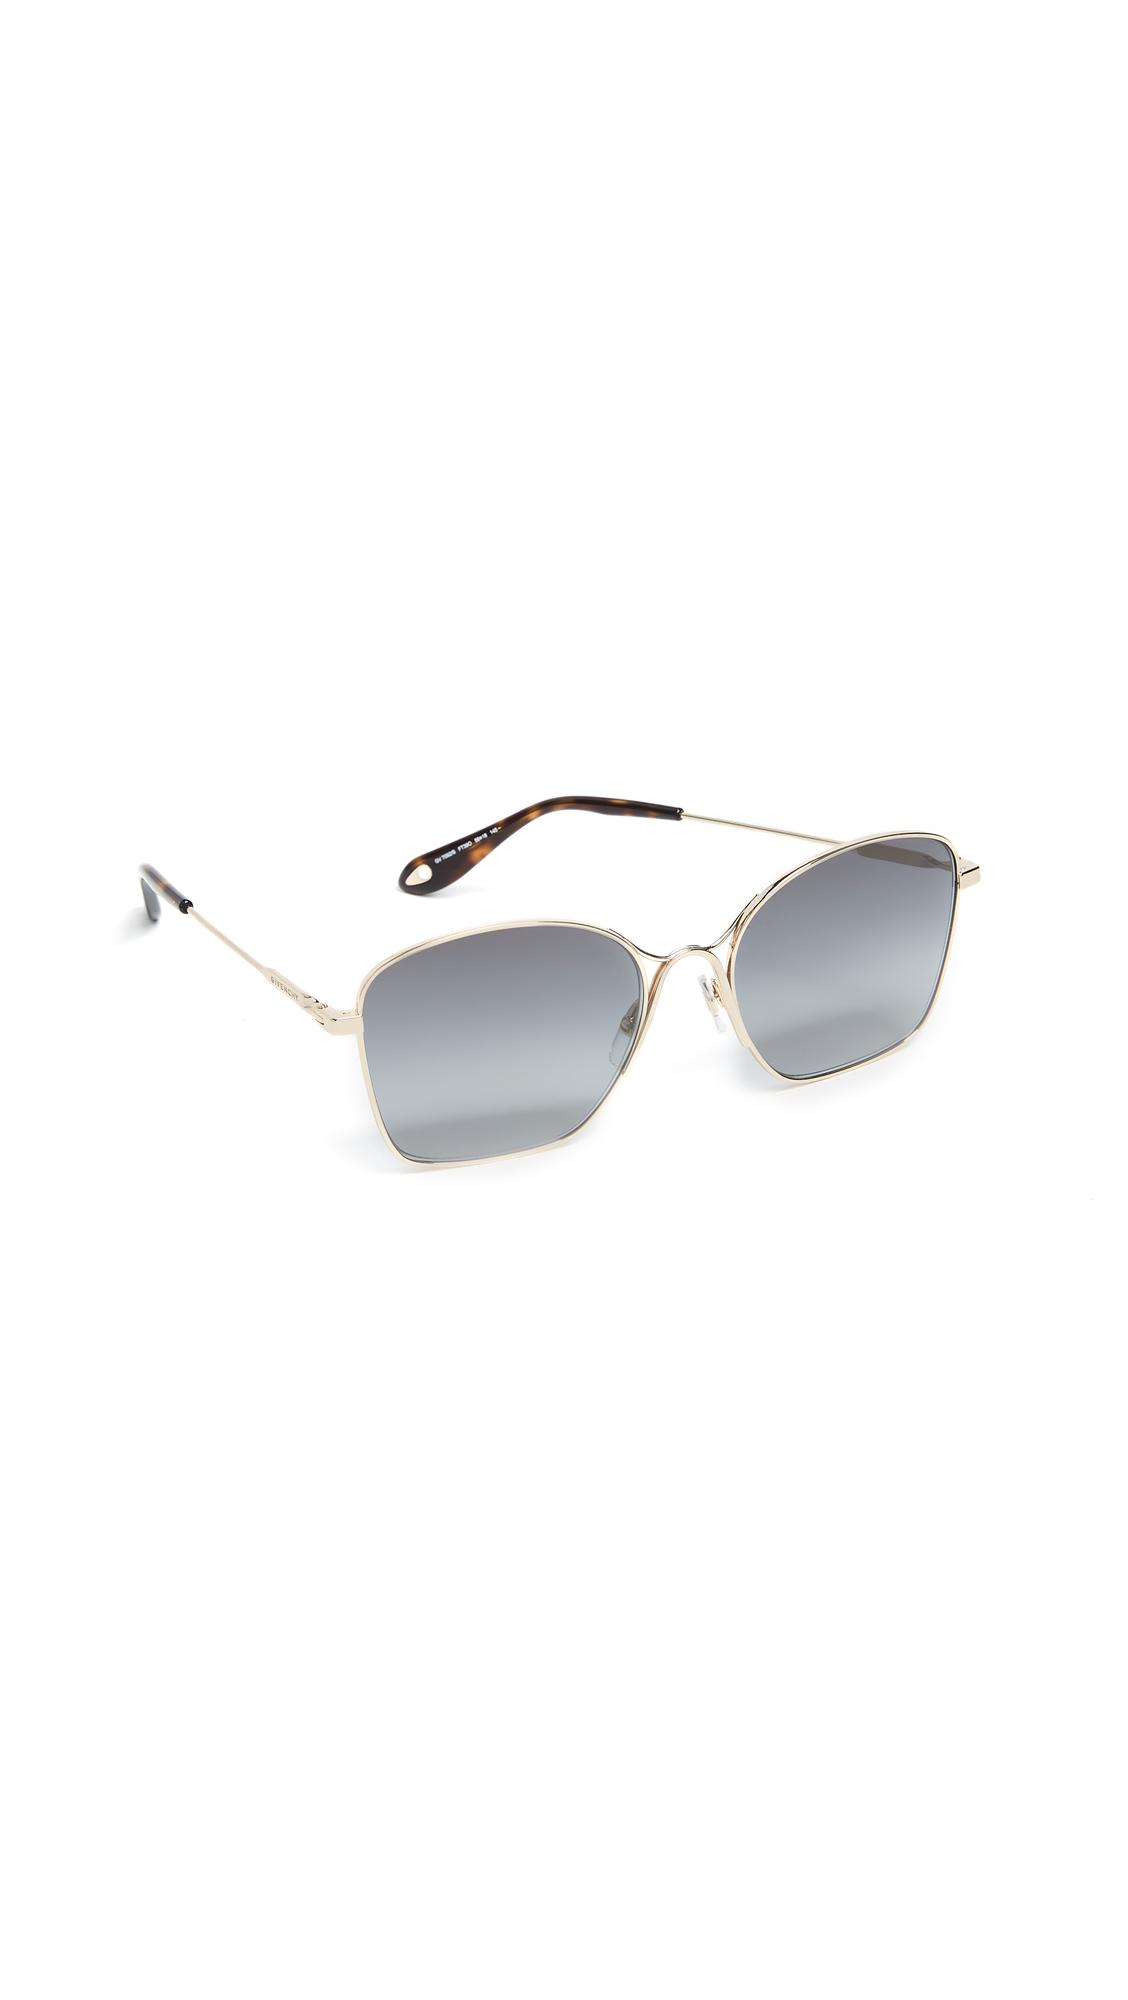 Square-frame metal sunglasses Givenchy RScjdg5bHY